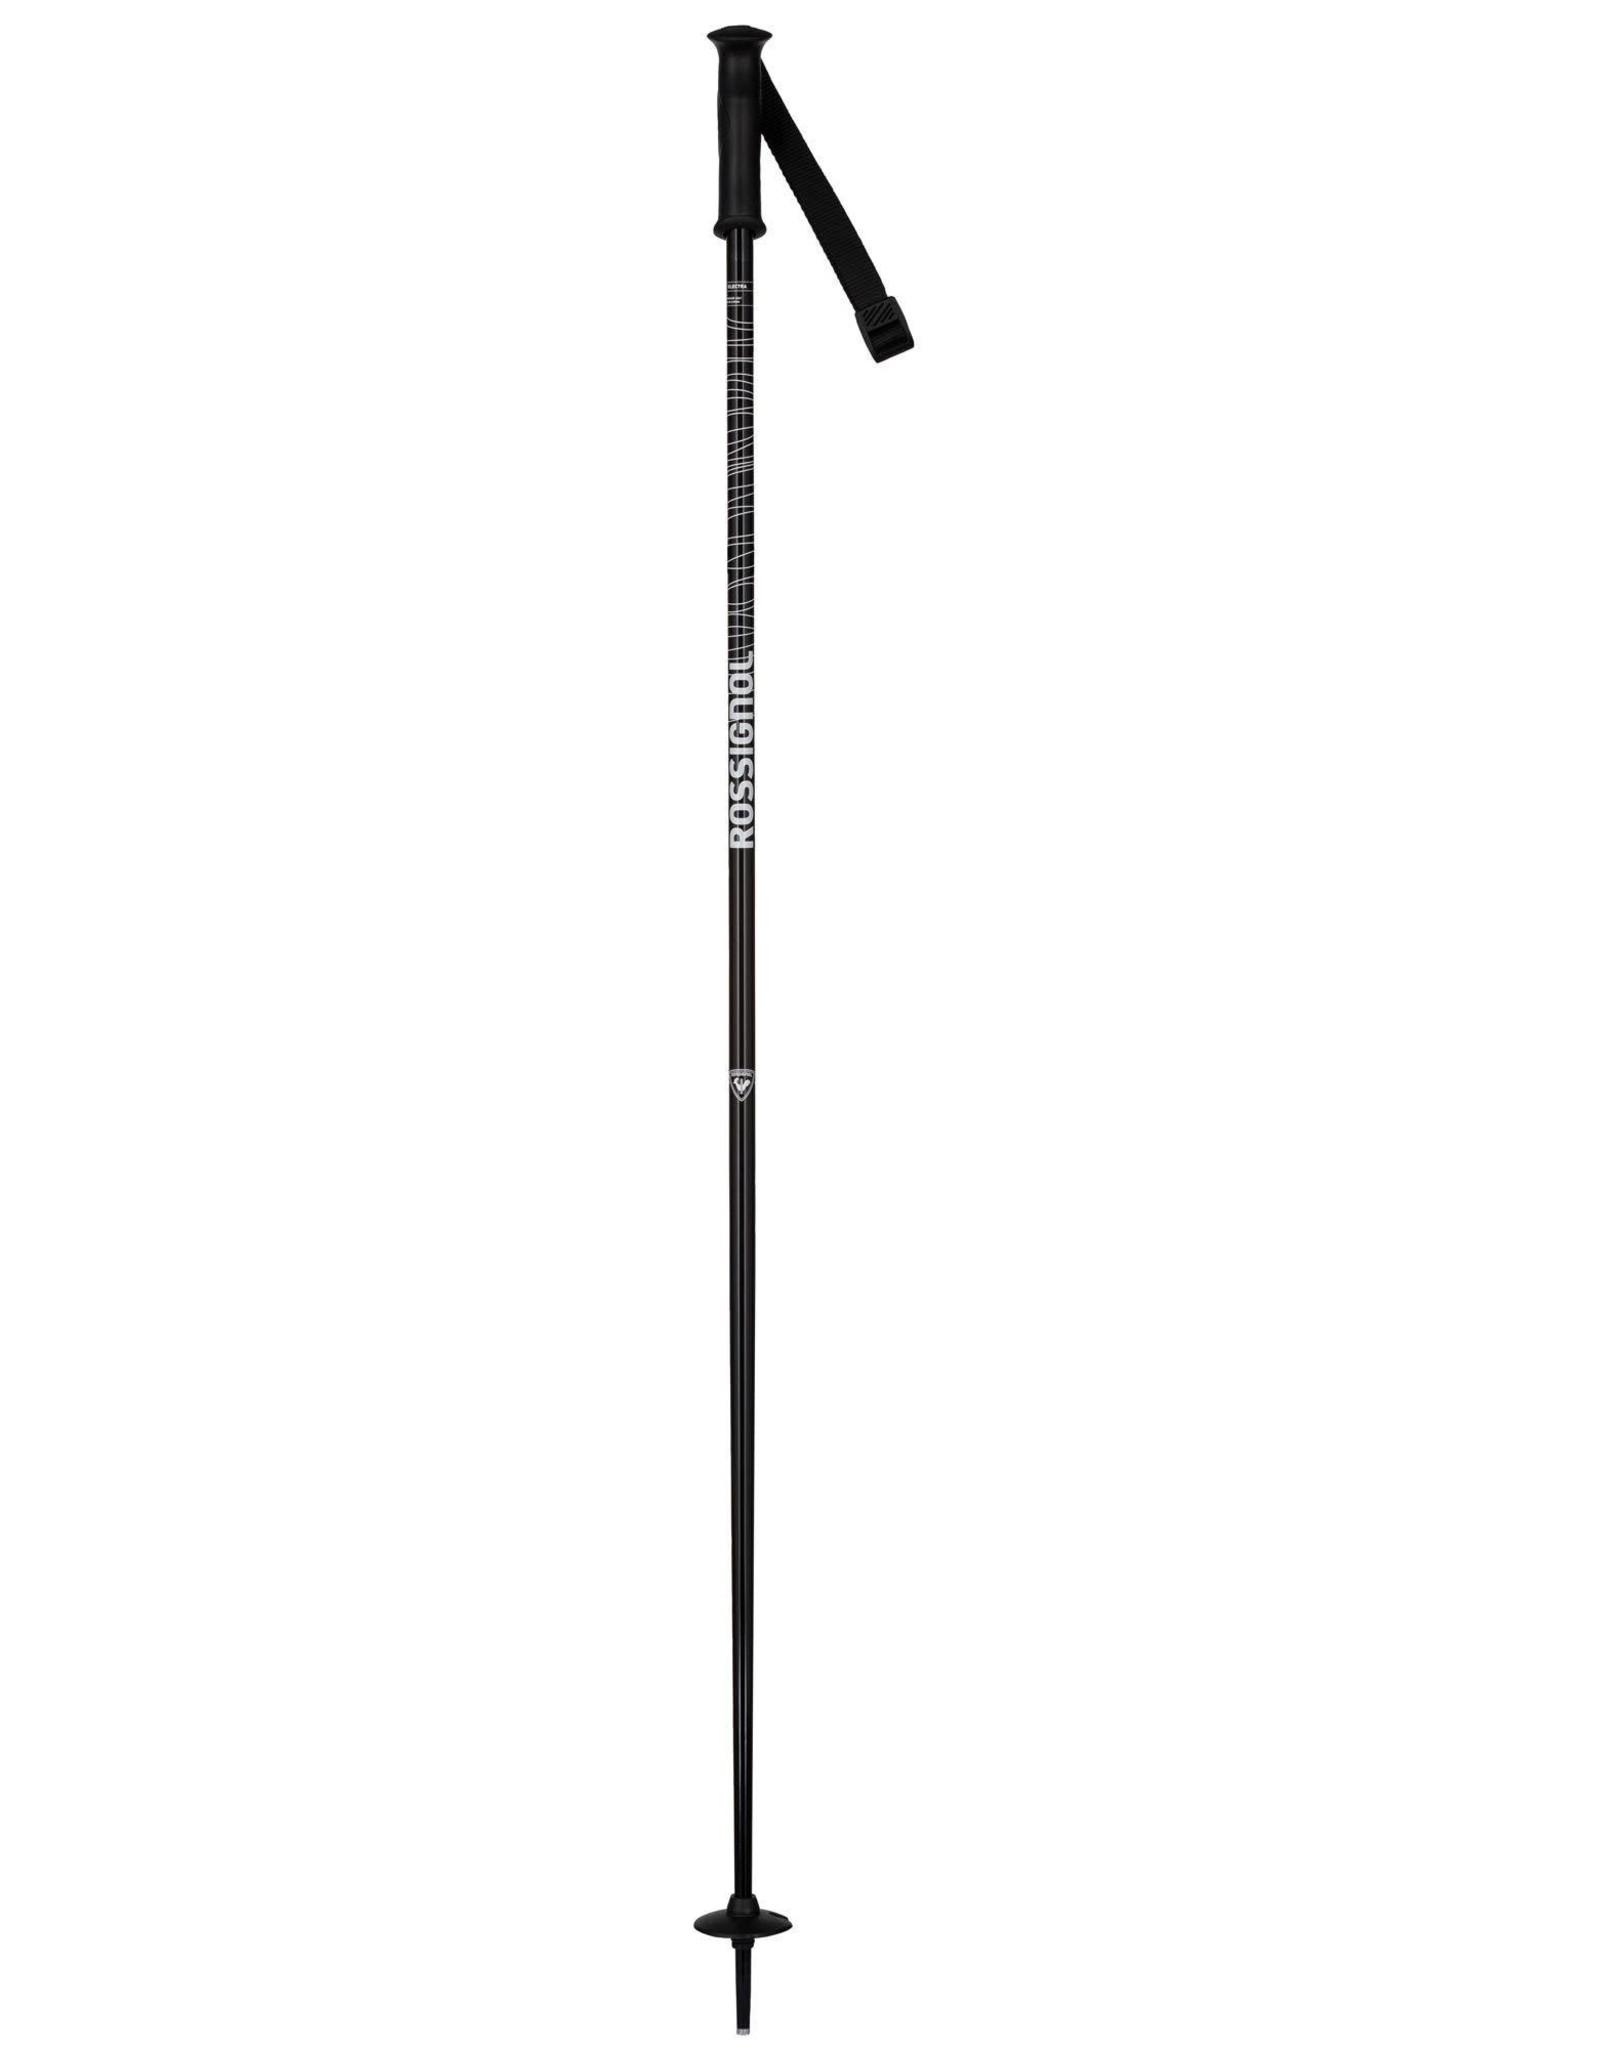 ROSSIGNOL ROSSIGNOL ELECTRA BLACK ALPINE SKI POLE SR 20